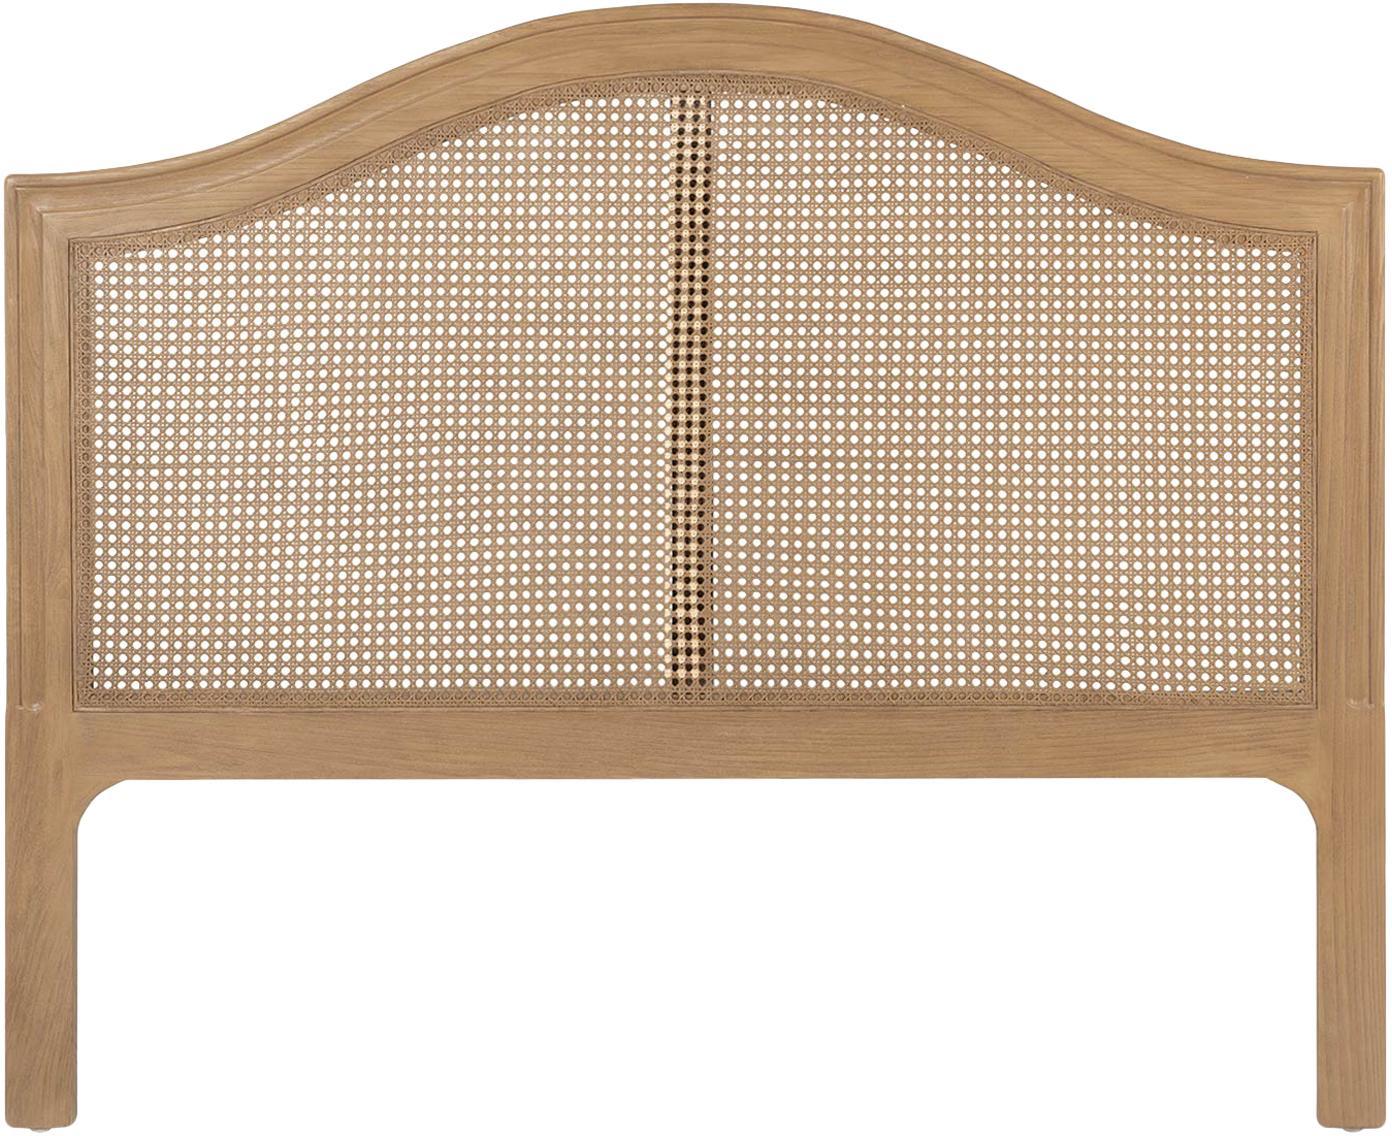 Cabecero Siena, Madera de roble, ratán, Beige, An 105 x Al 120 cm